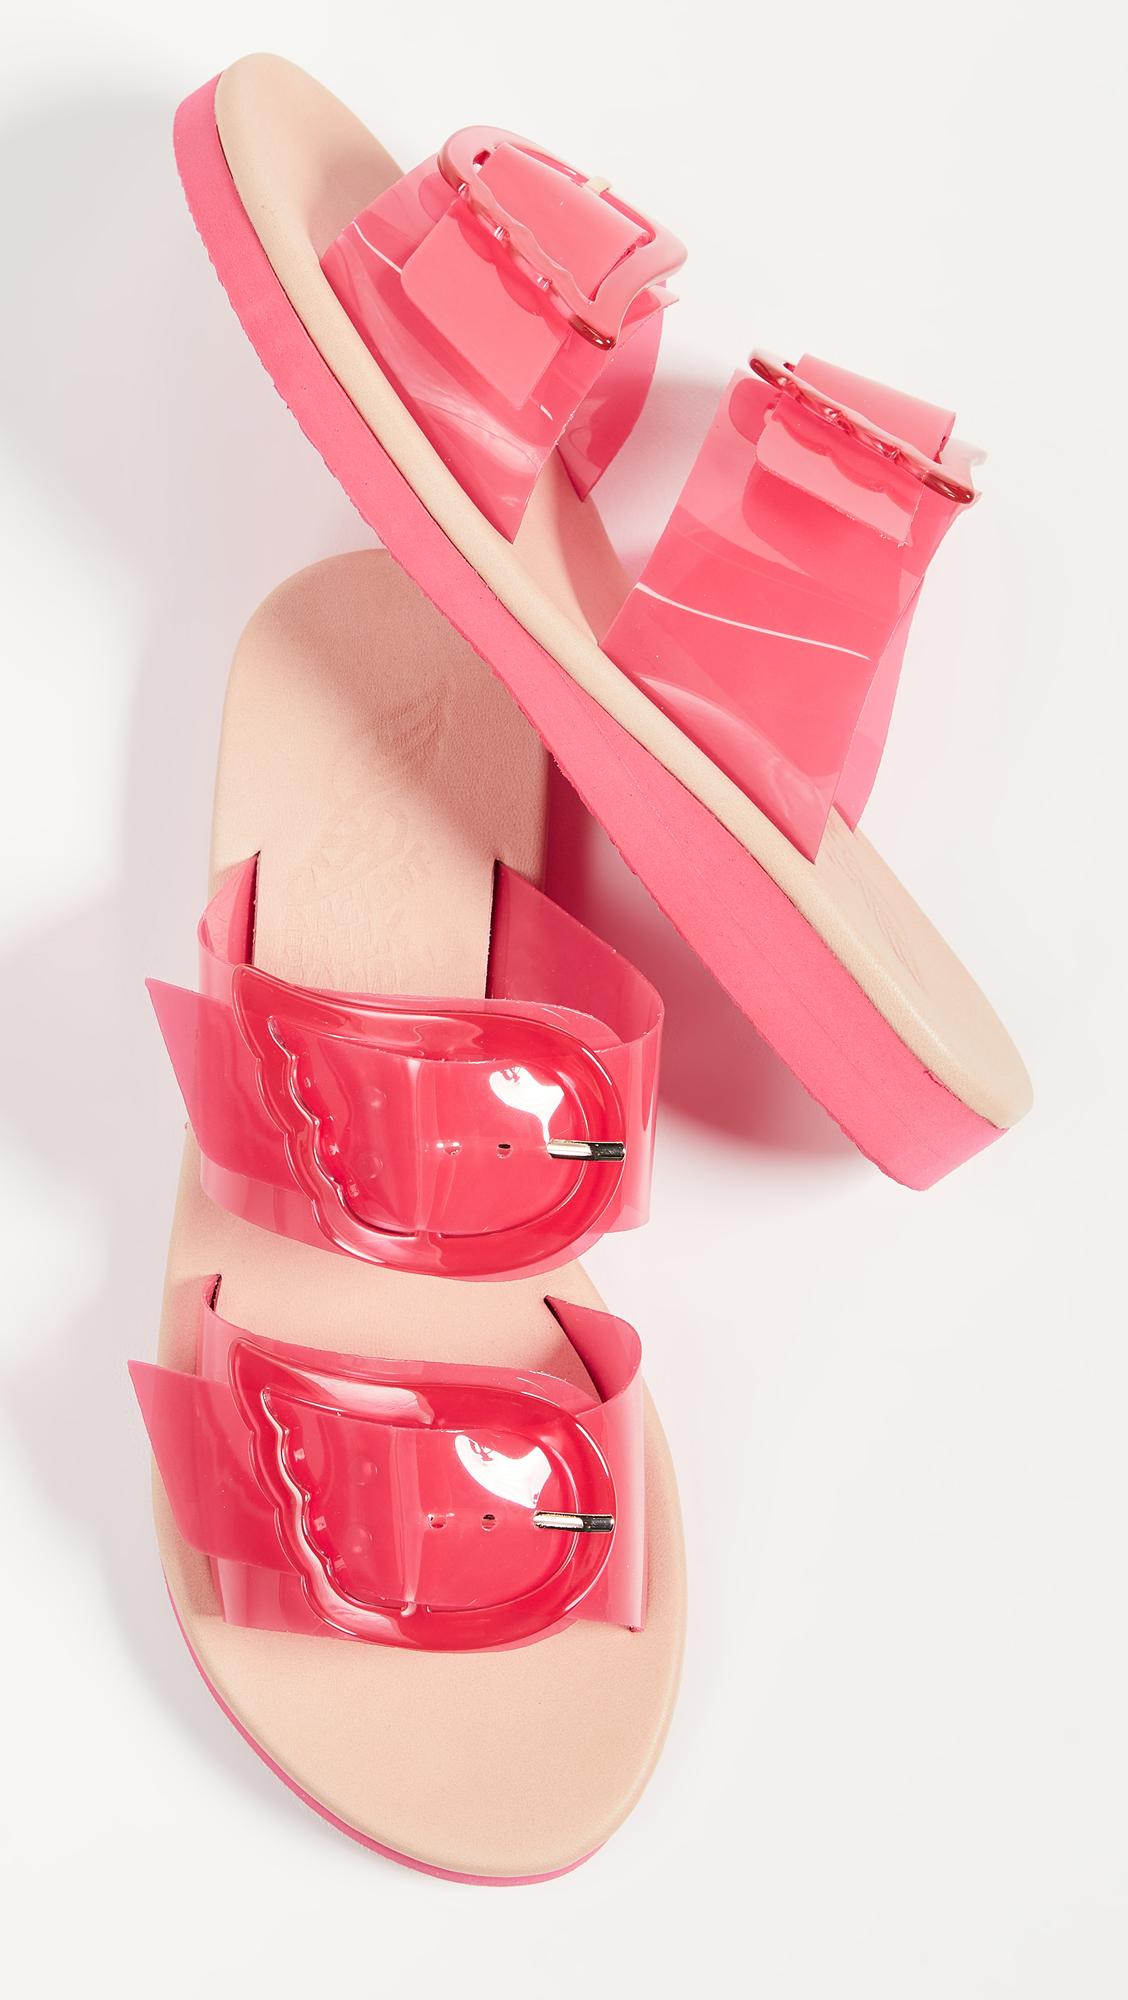 please remove sticker on bottom shoe strap. thx